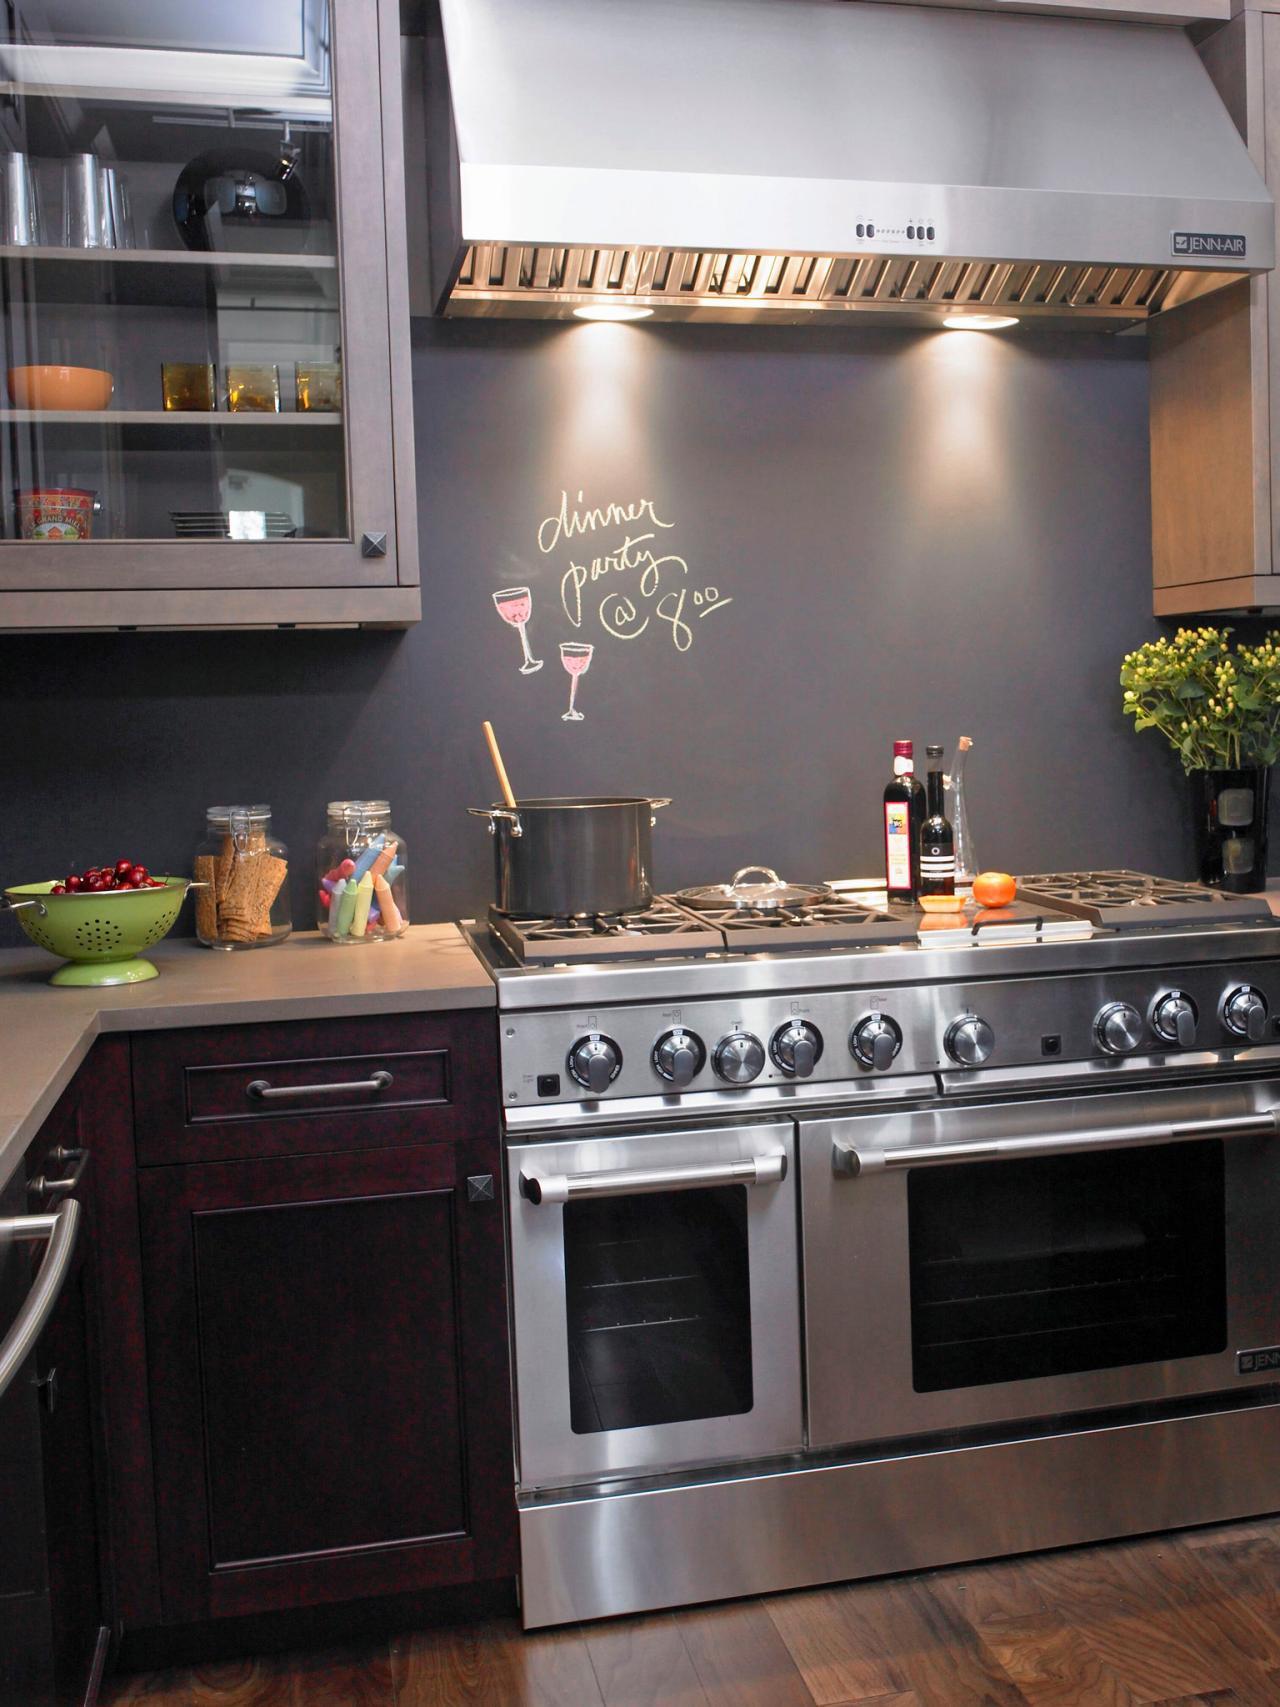 Best ideas about DIY Kitchens Ideas . Save or Pin DIY Kitchen Backsplash Ideas Now.